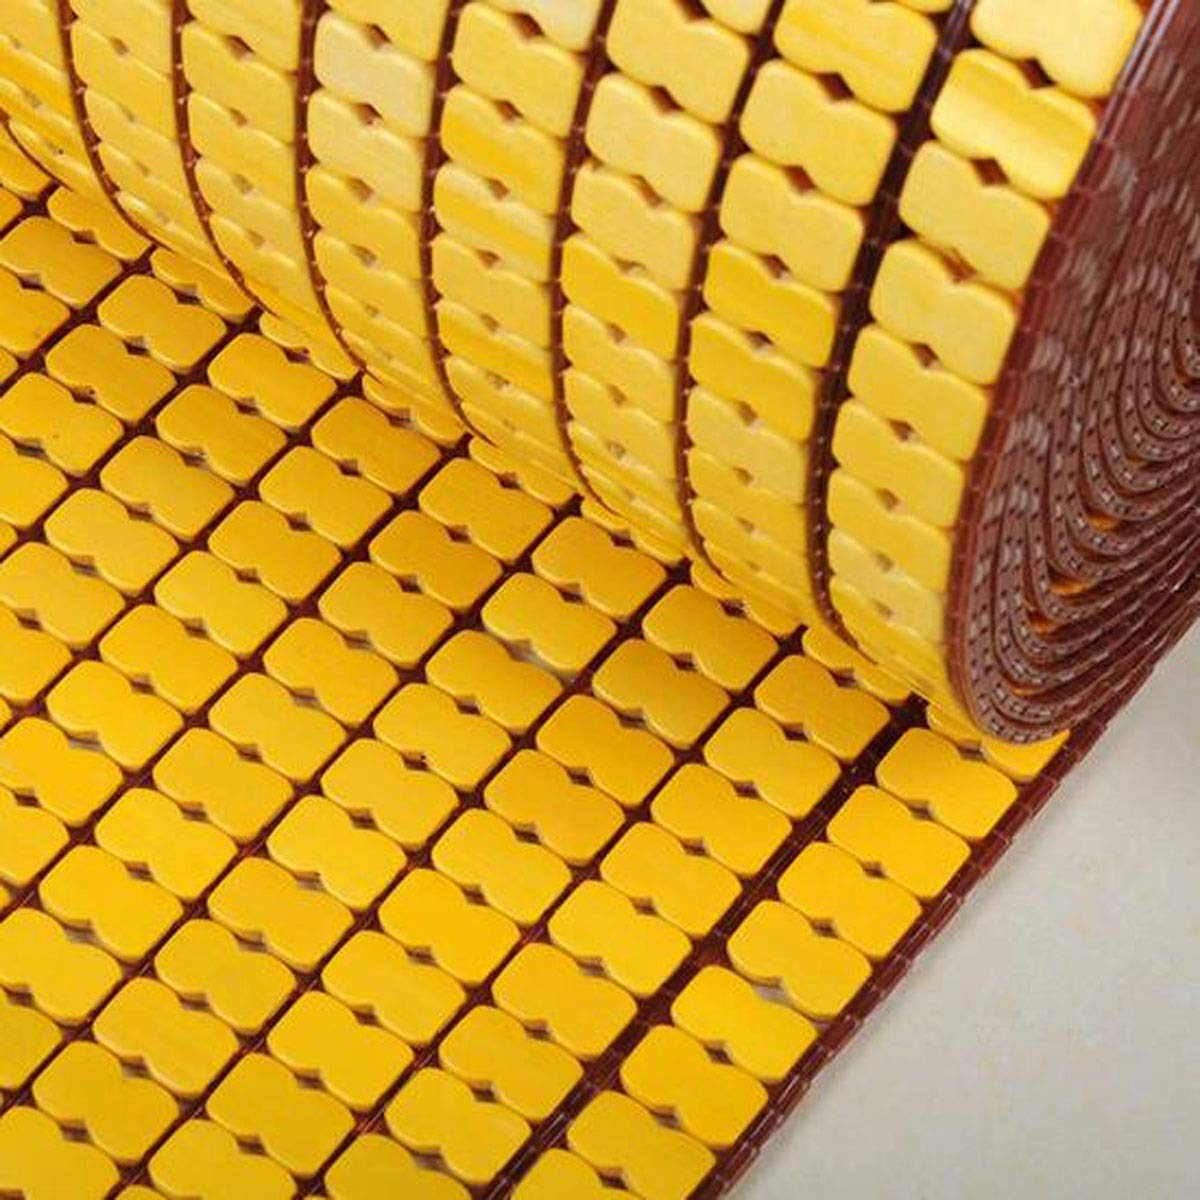 Jielongtongxun 木製マット、夏バルコニー出窓滑り止め竹マット、車のソファ麻雀学生寮の椅子竹マット、ベージュ、マルチ特別オプション (Color : Beige, Size : 90*190cm) 90*190cm Beige B07RMCT8MG